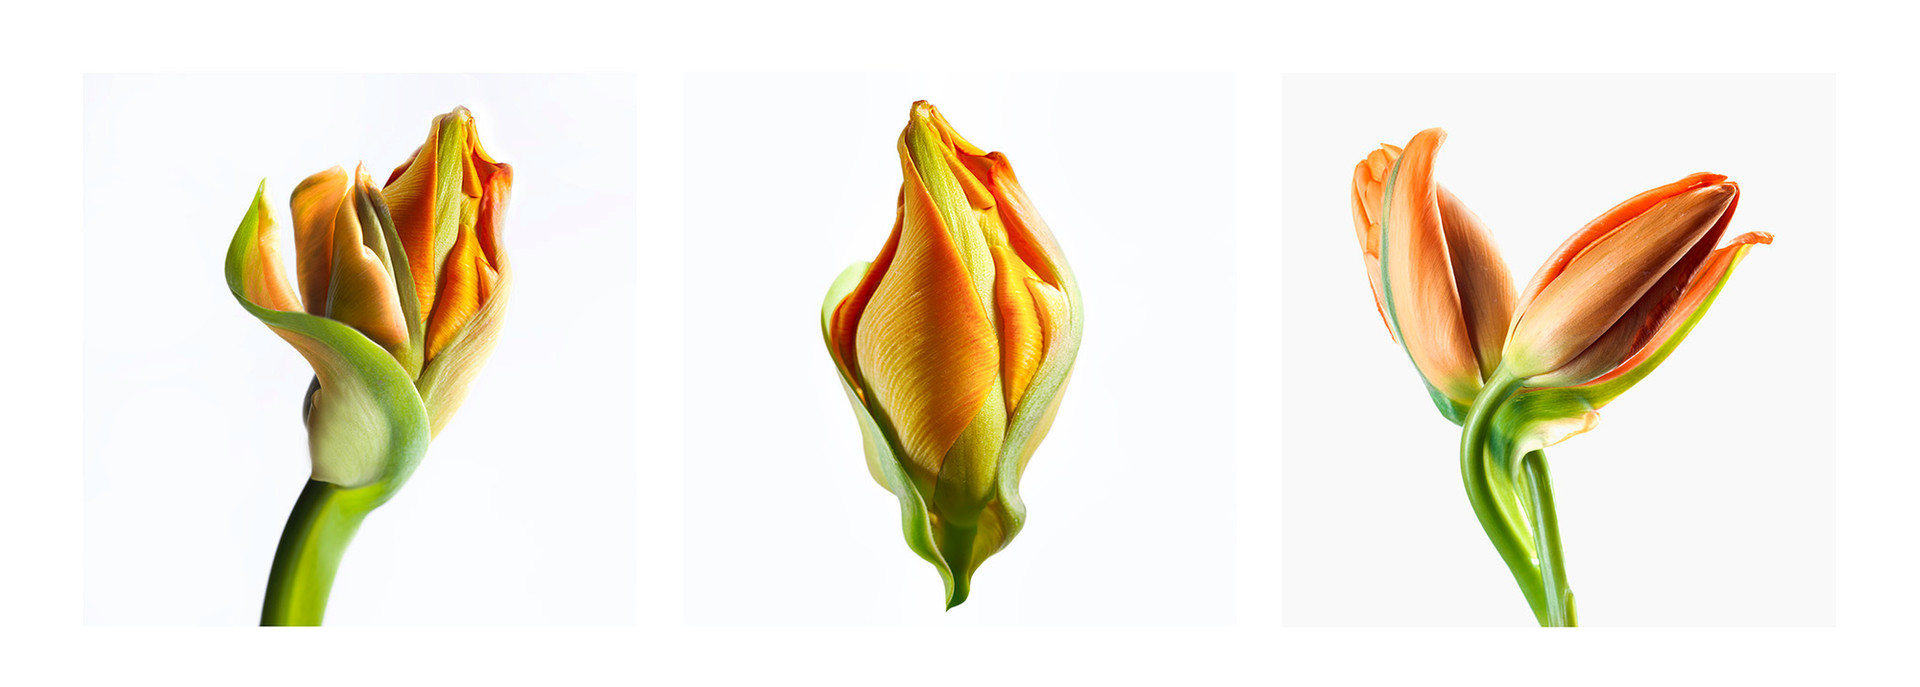 JF Triptichon 13 Orange Tulip